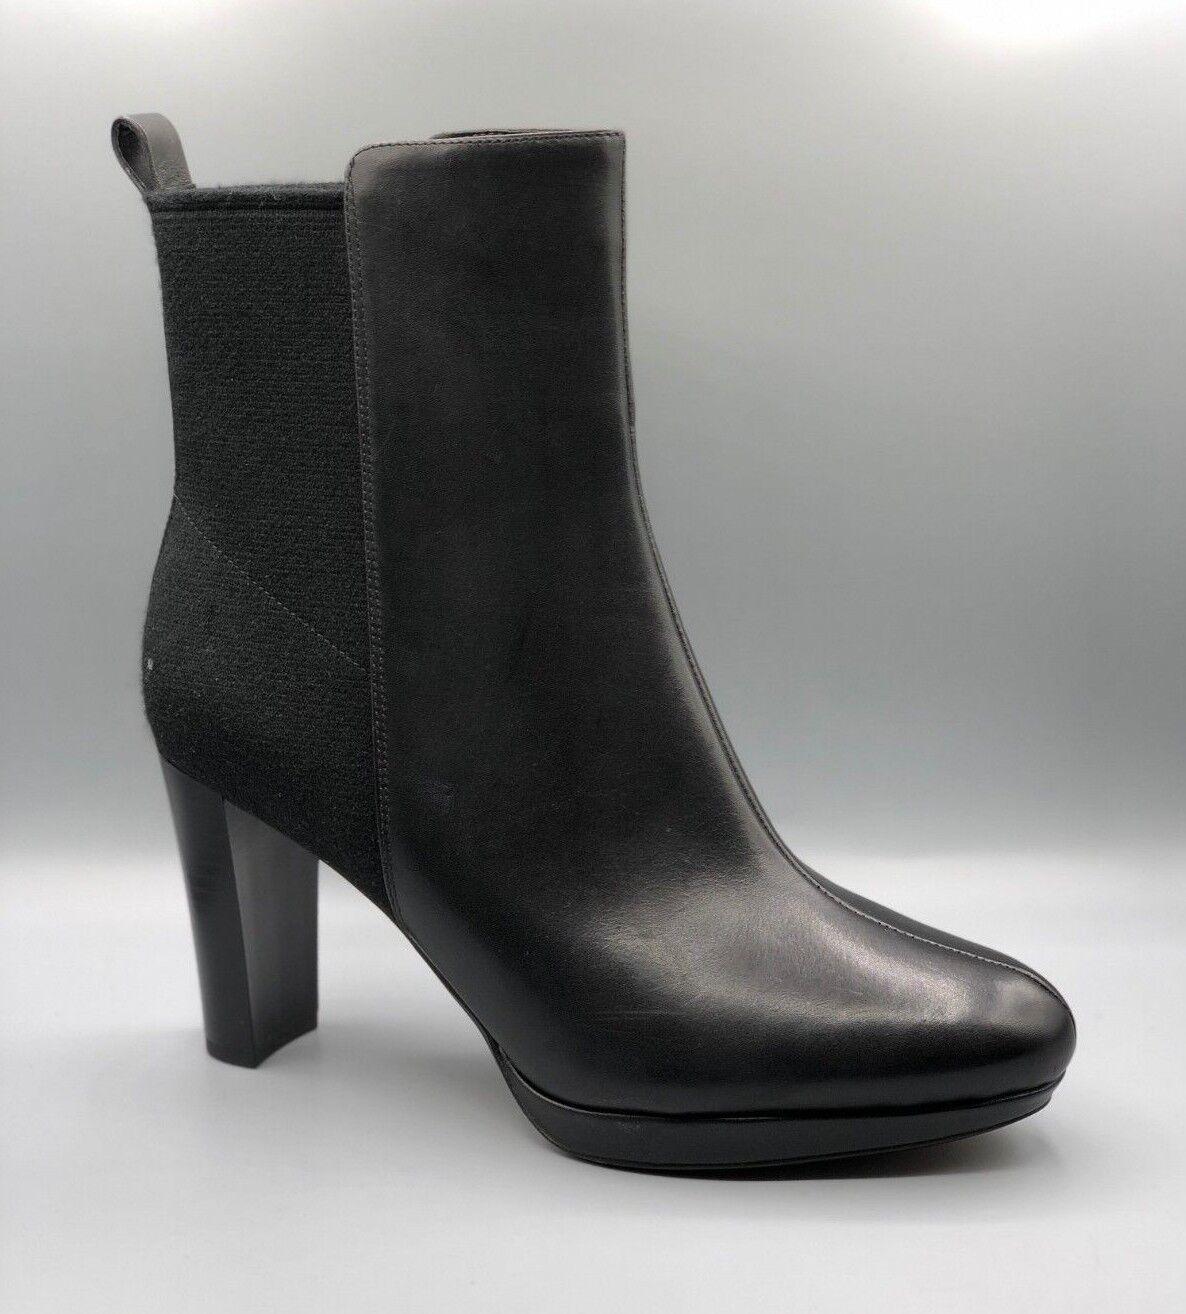 New Clarks  Kendra Porter  Femmes en Cuir Noir Bottines Chelsea UK 7 D